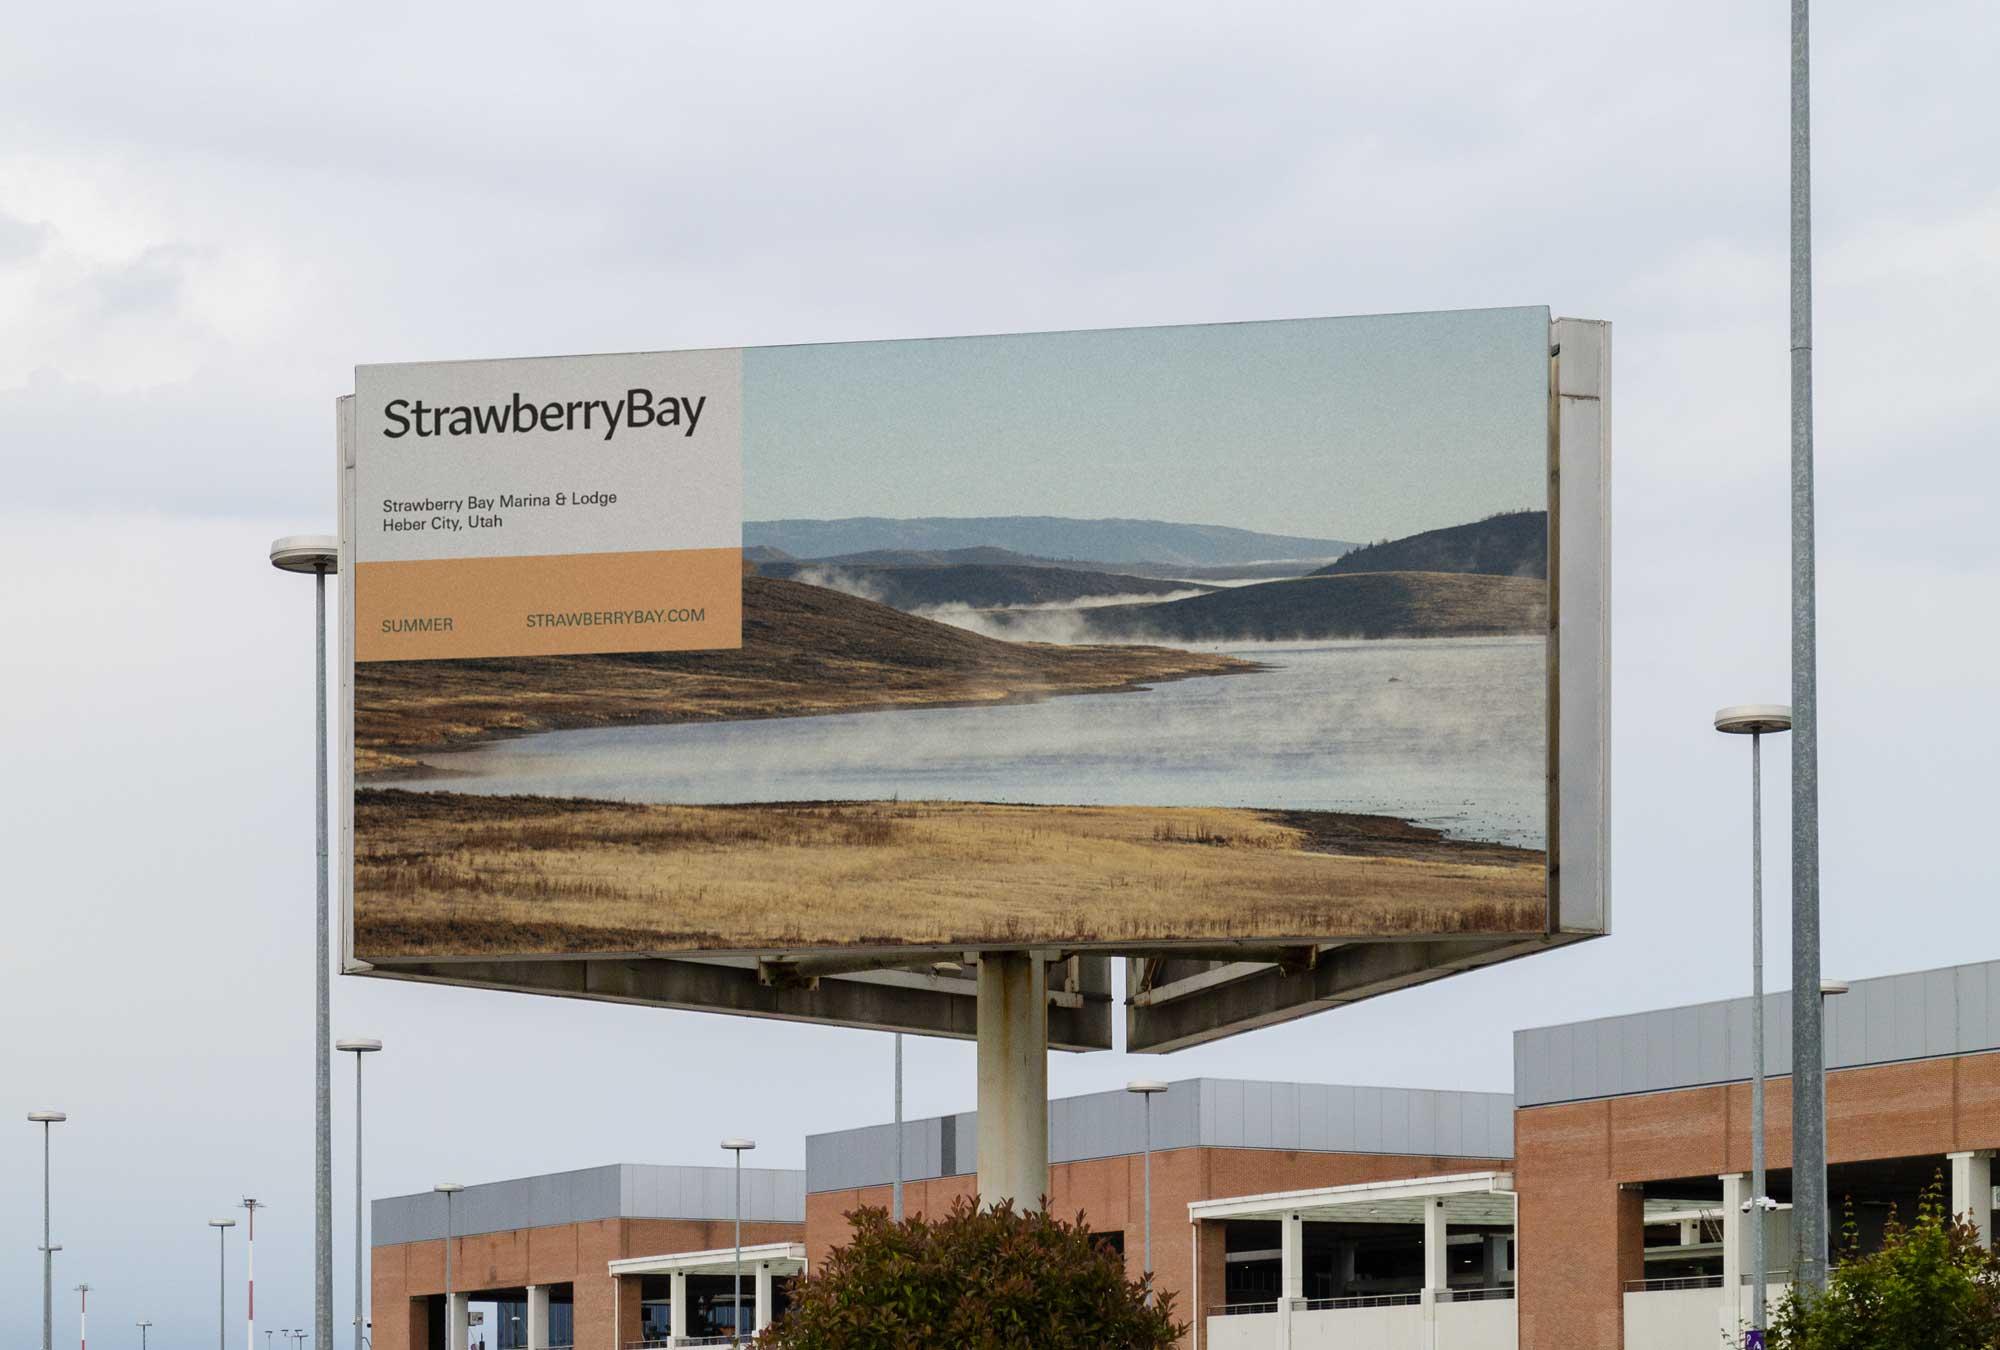 strawberrybay_billboard